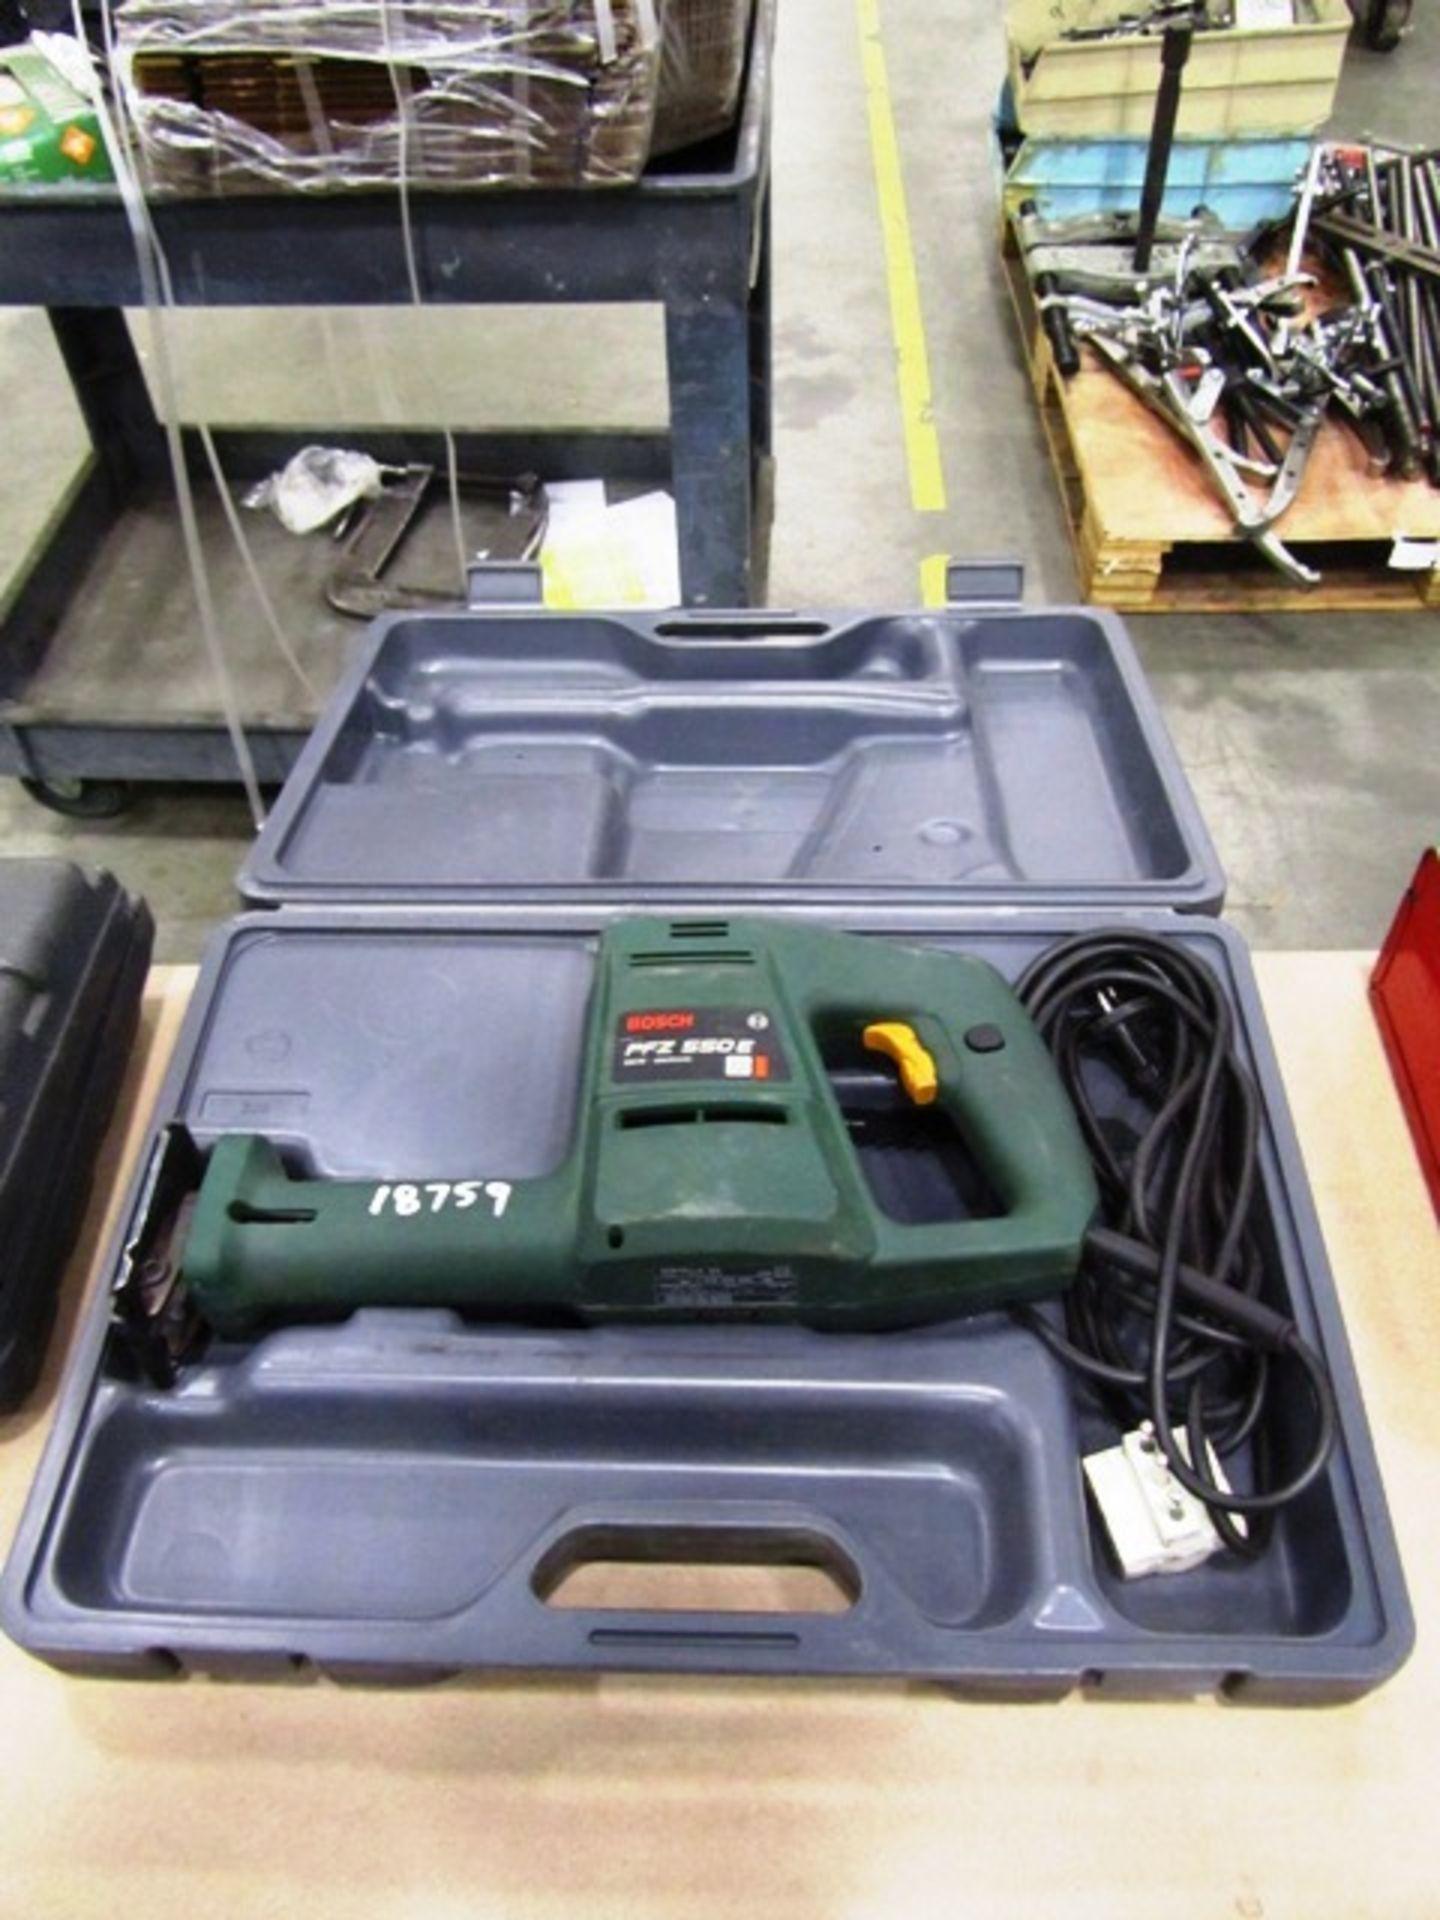 Bosch PFZ 550 E Electric Reciprocating Saw